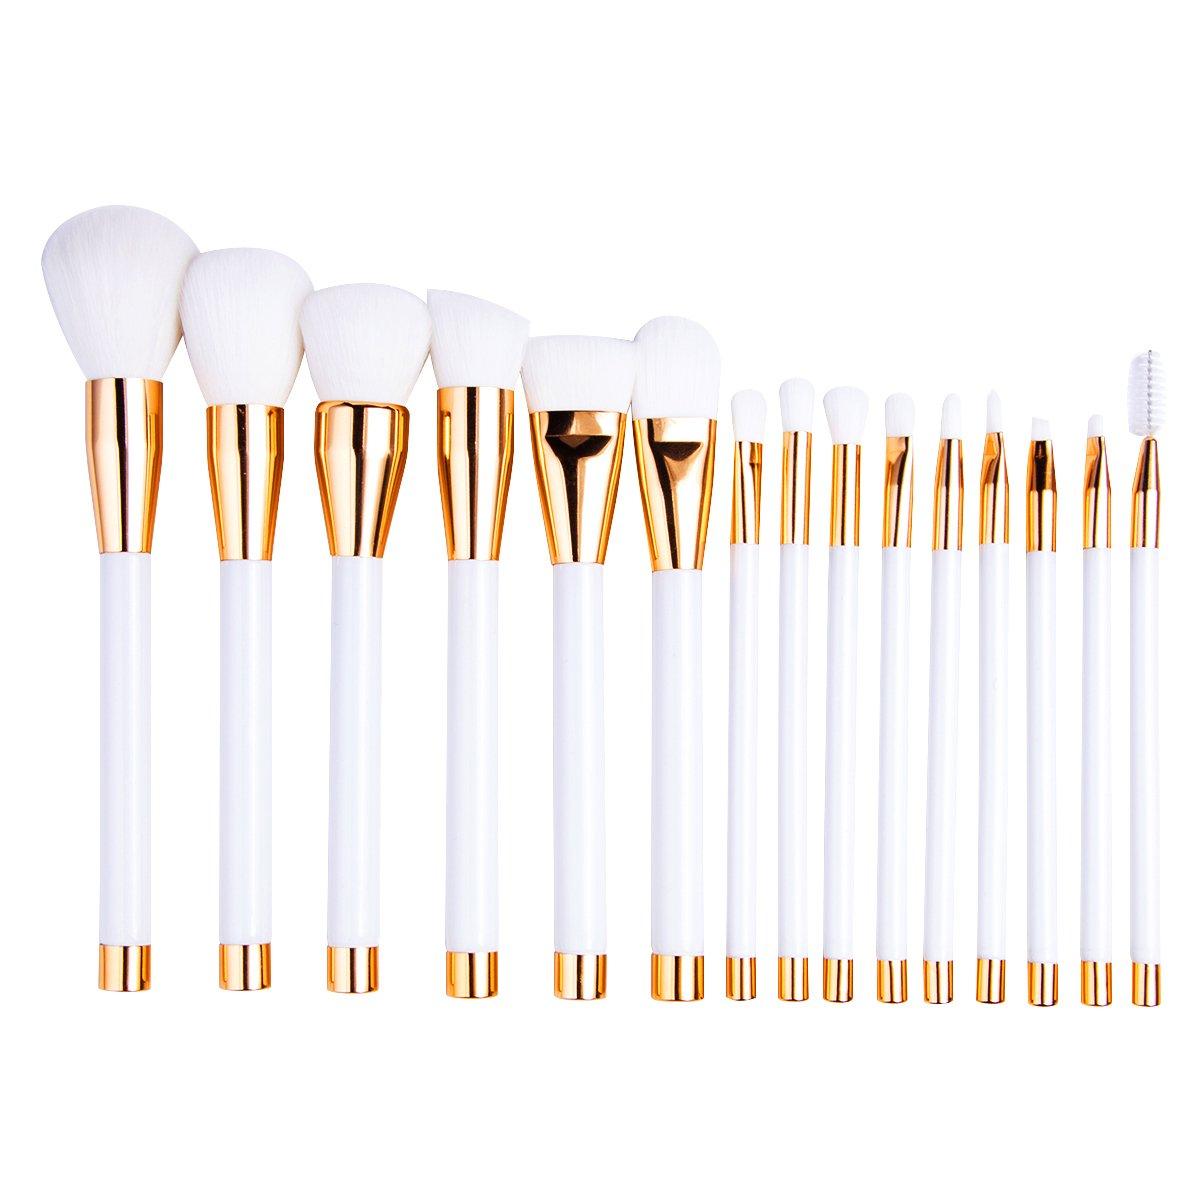 Brochas de Maquillaje, 15 pcs profesional fundación pinceles de maquillaje sombra de ojos maquillaje juego de brochas kabuki cara pinceles brochas de maquillaje Kit de polvo colorete, corrector, color blanco